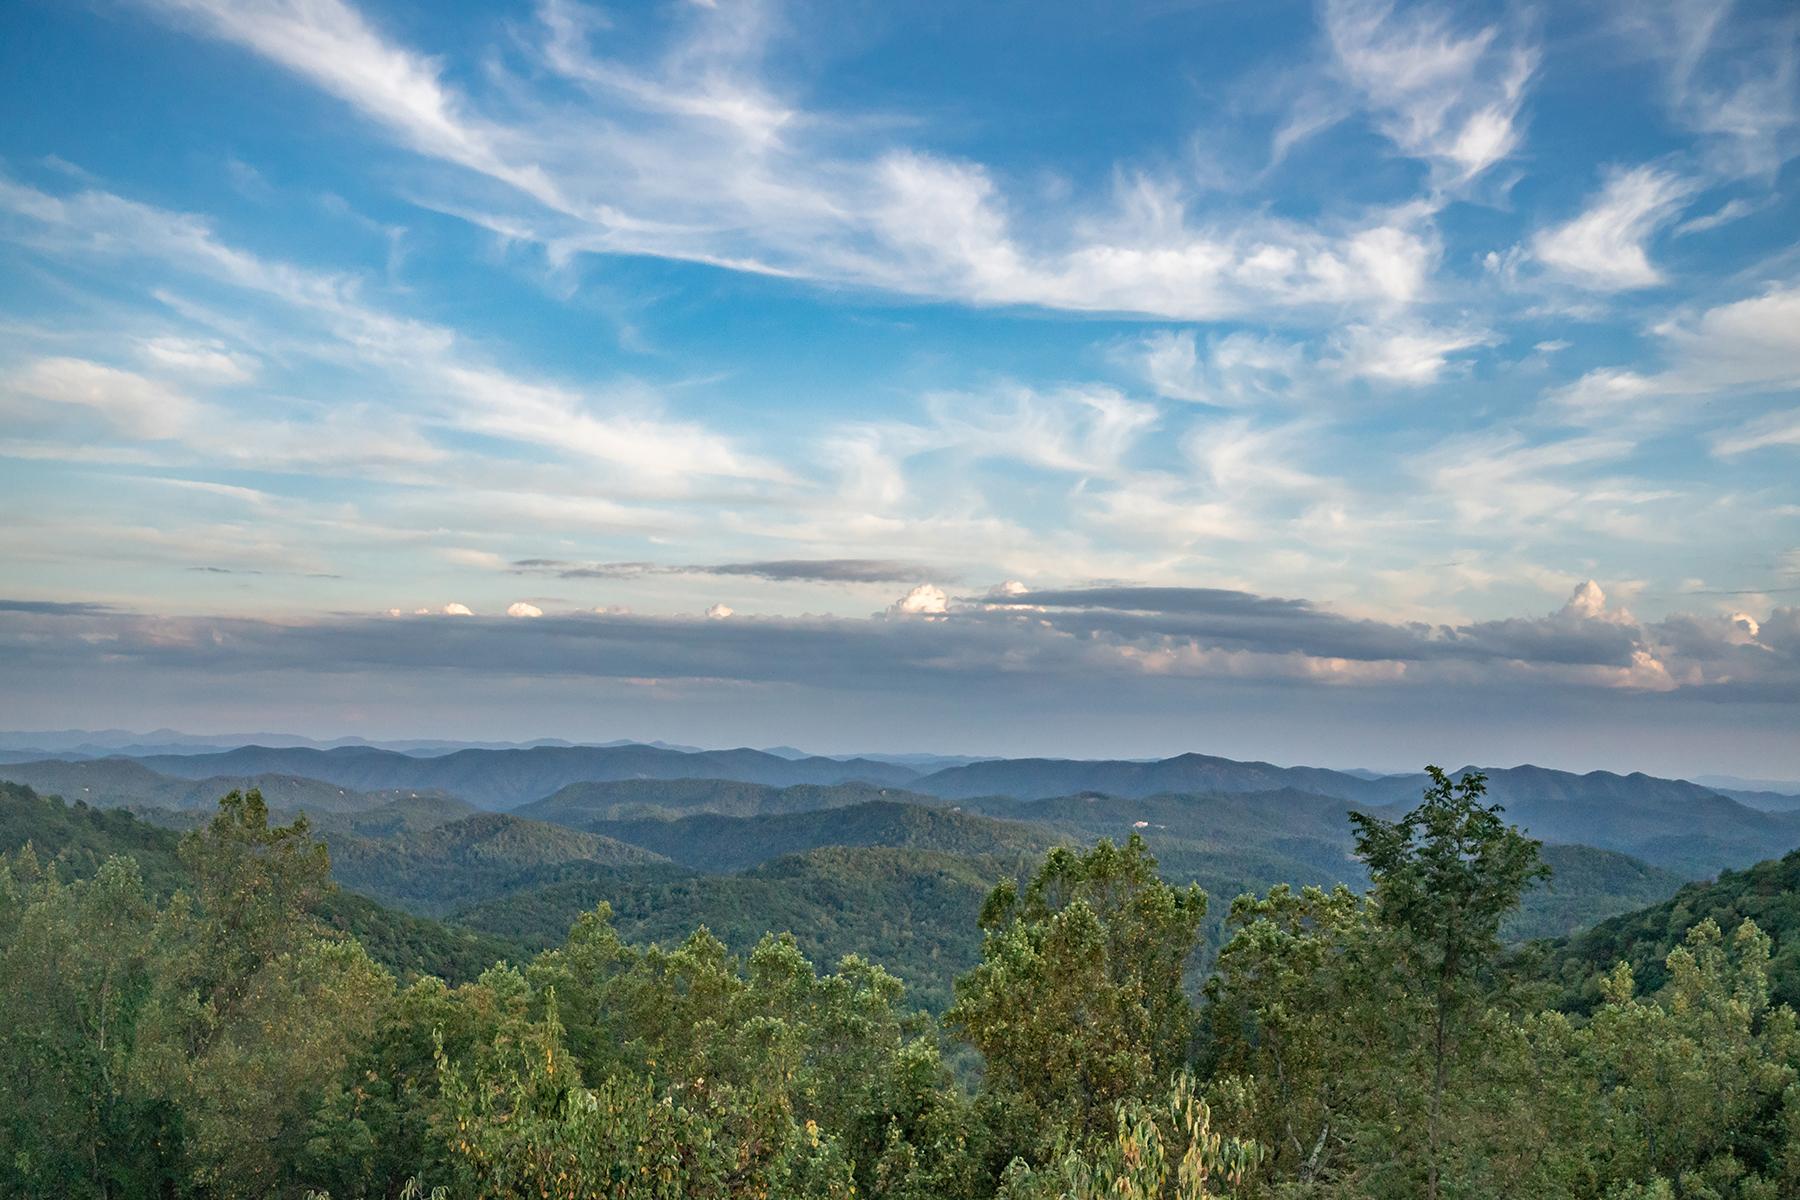 Single Family Homes for Active at THUNDERHILL ESTATES - BOONE 1469 Orchard Ln Boone, North Carolina 28607 United States